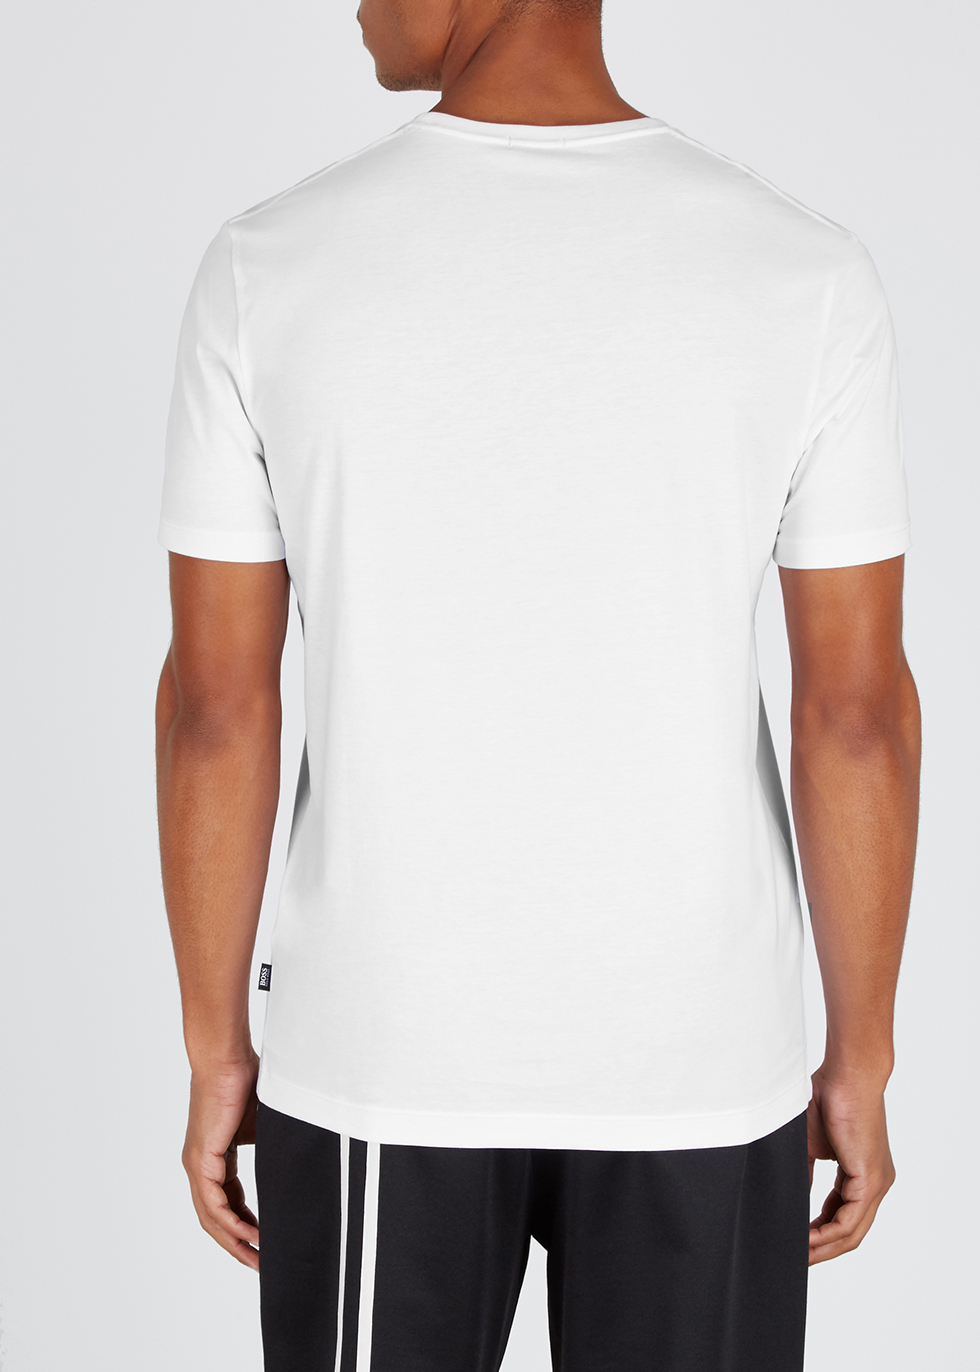 Tiburt white cotton T-shirt - HUGO